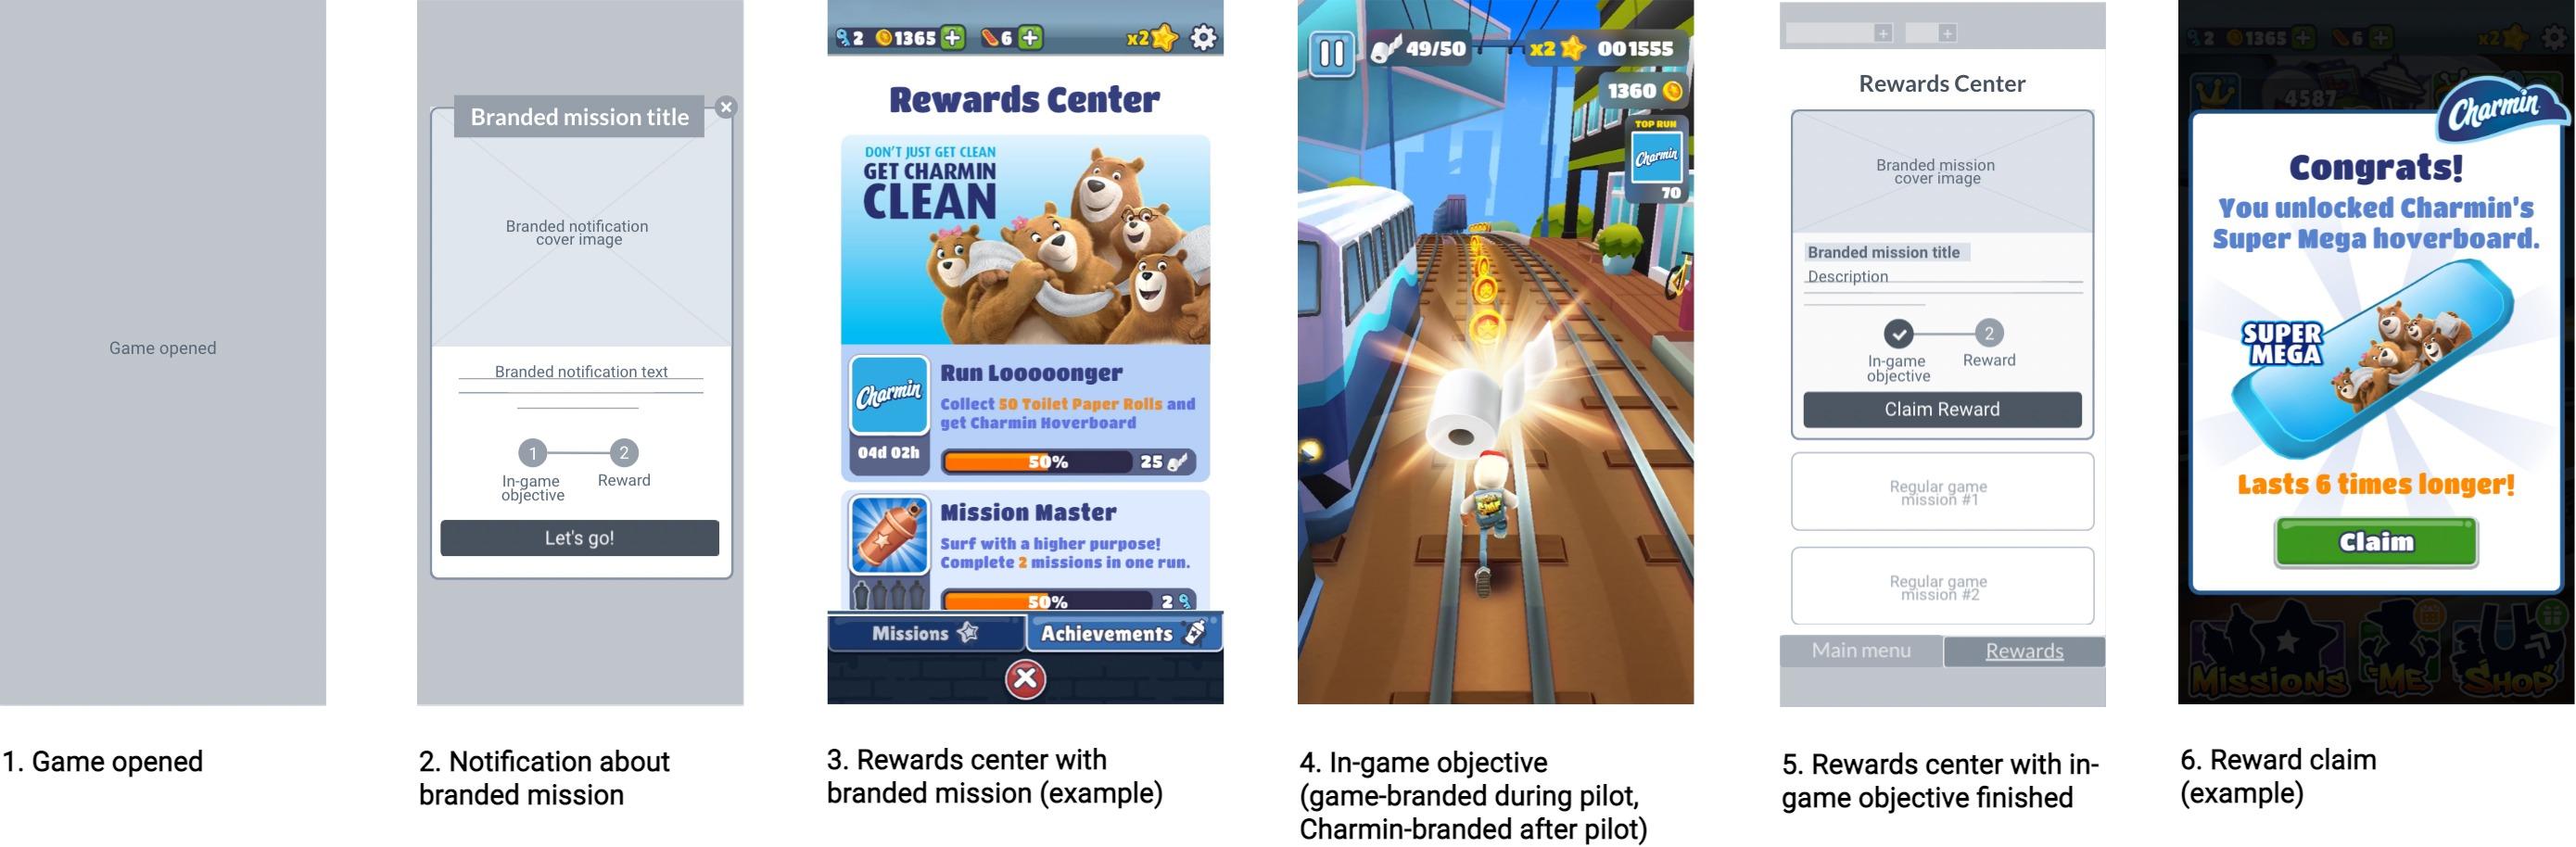 Player journey